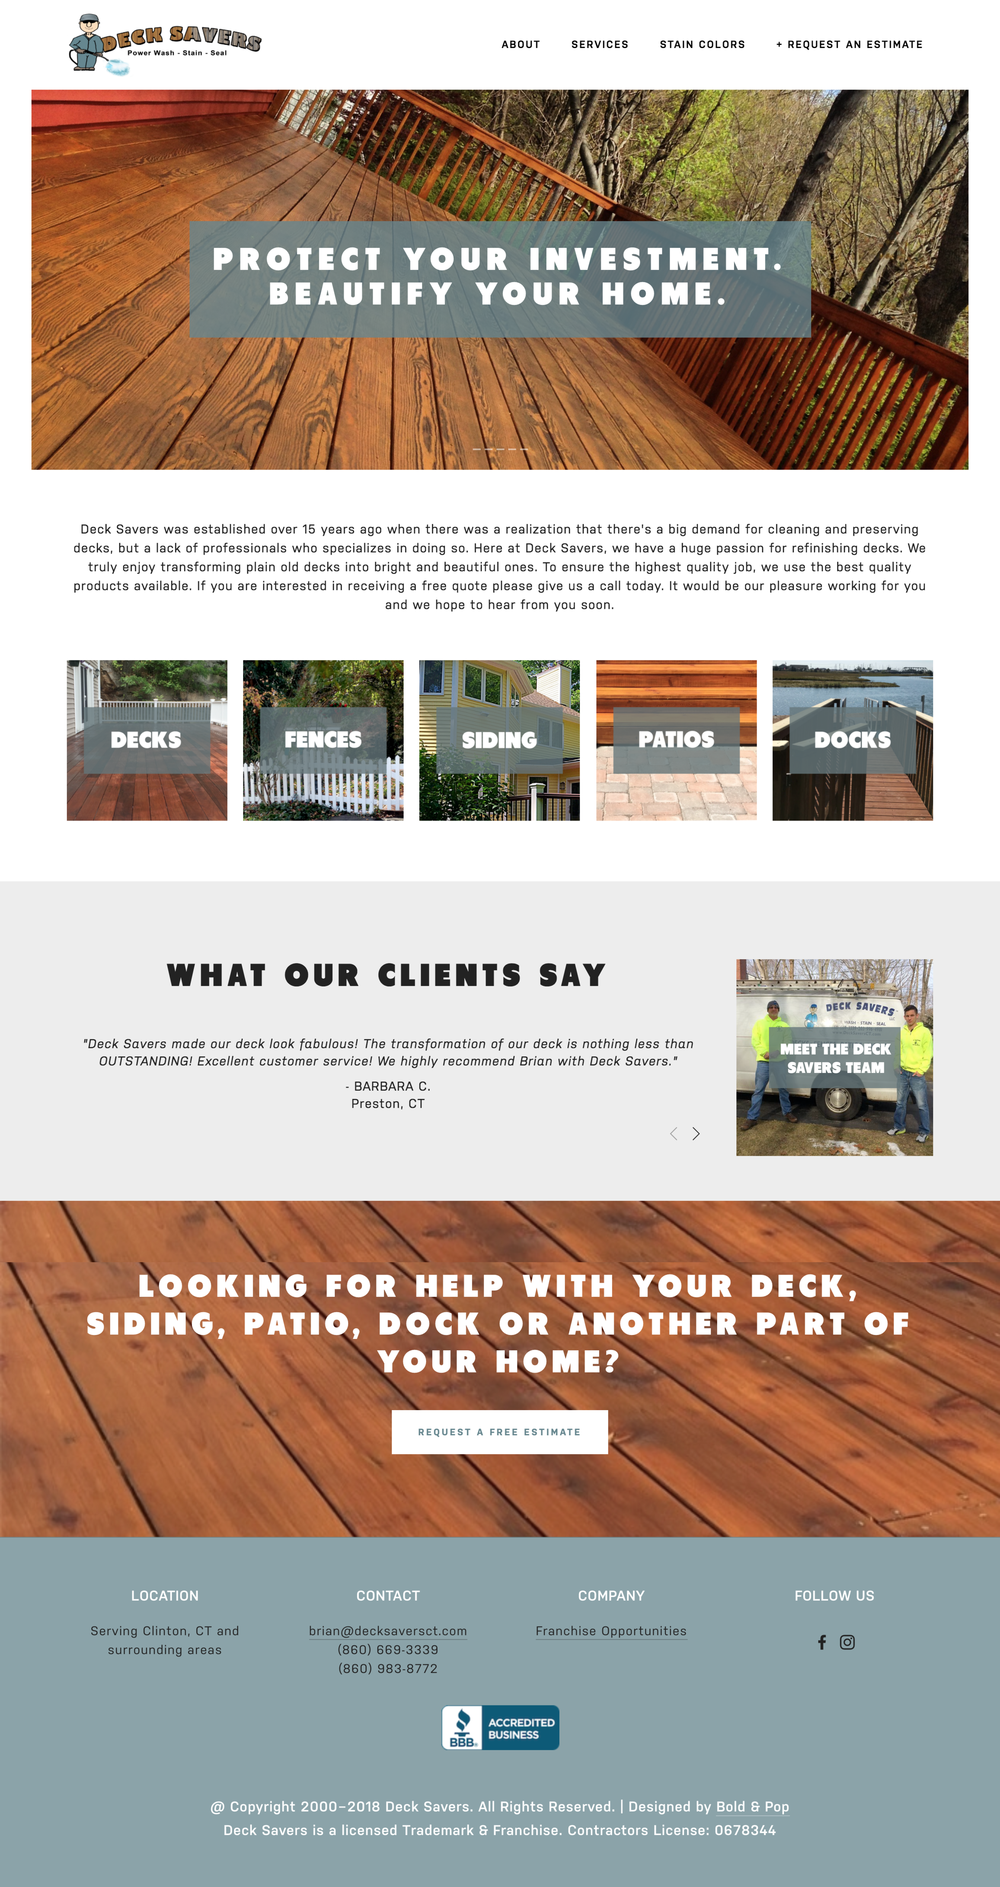 Bold+&+Pop+_+Deck+Savers+Squarespace+Website+Design.png